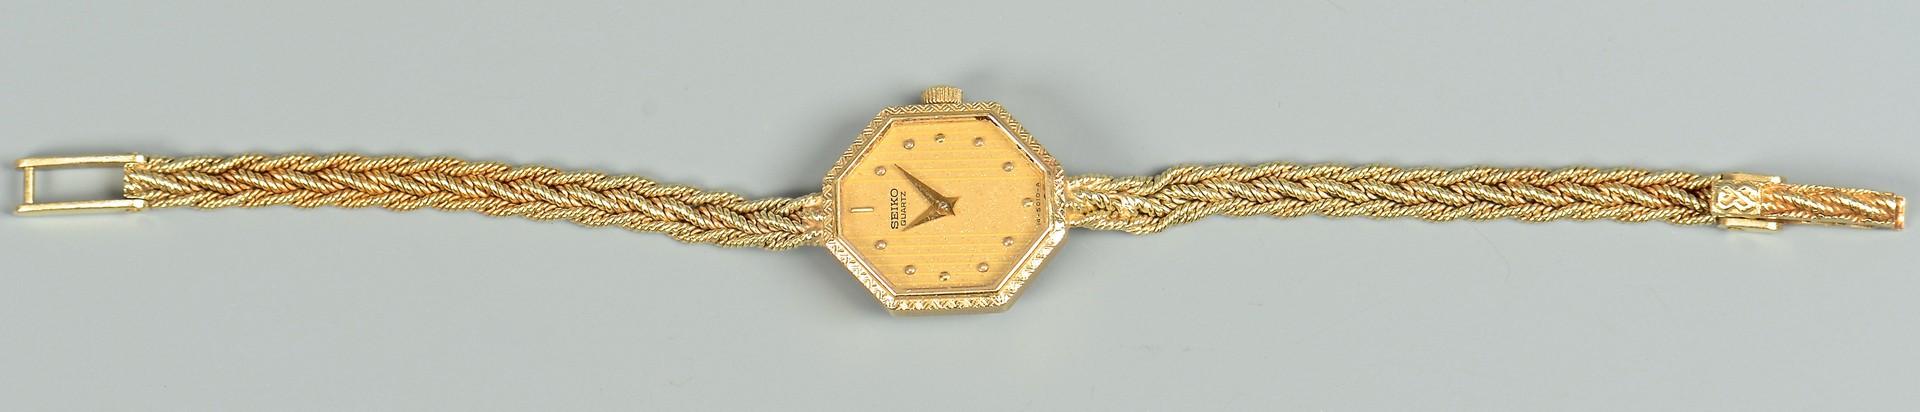 Lot 358: 14k Lady's Seiko watch